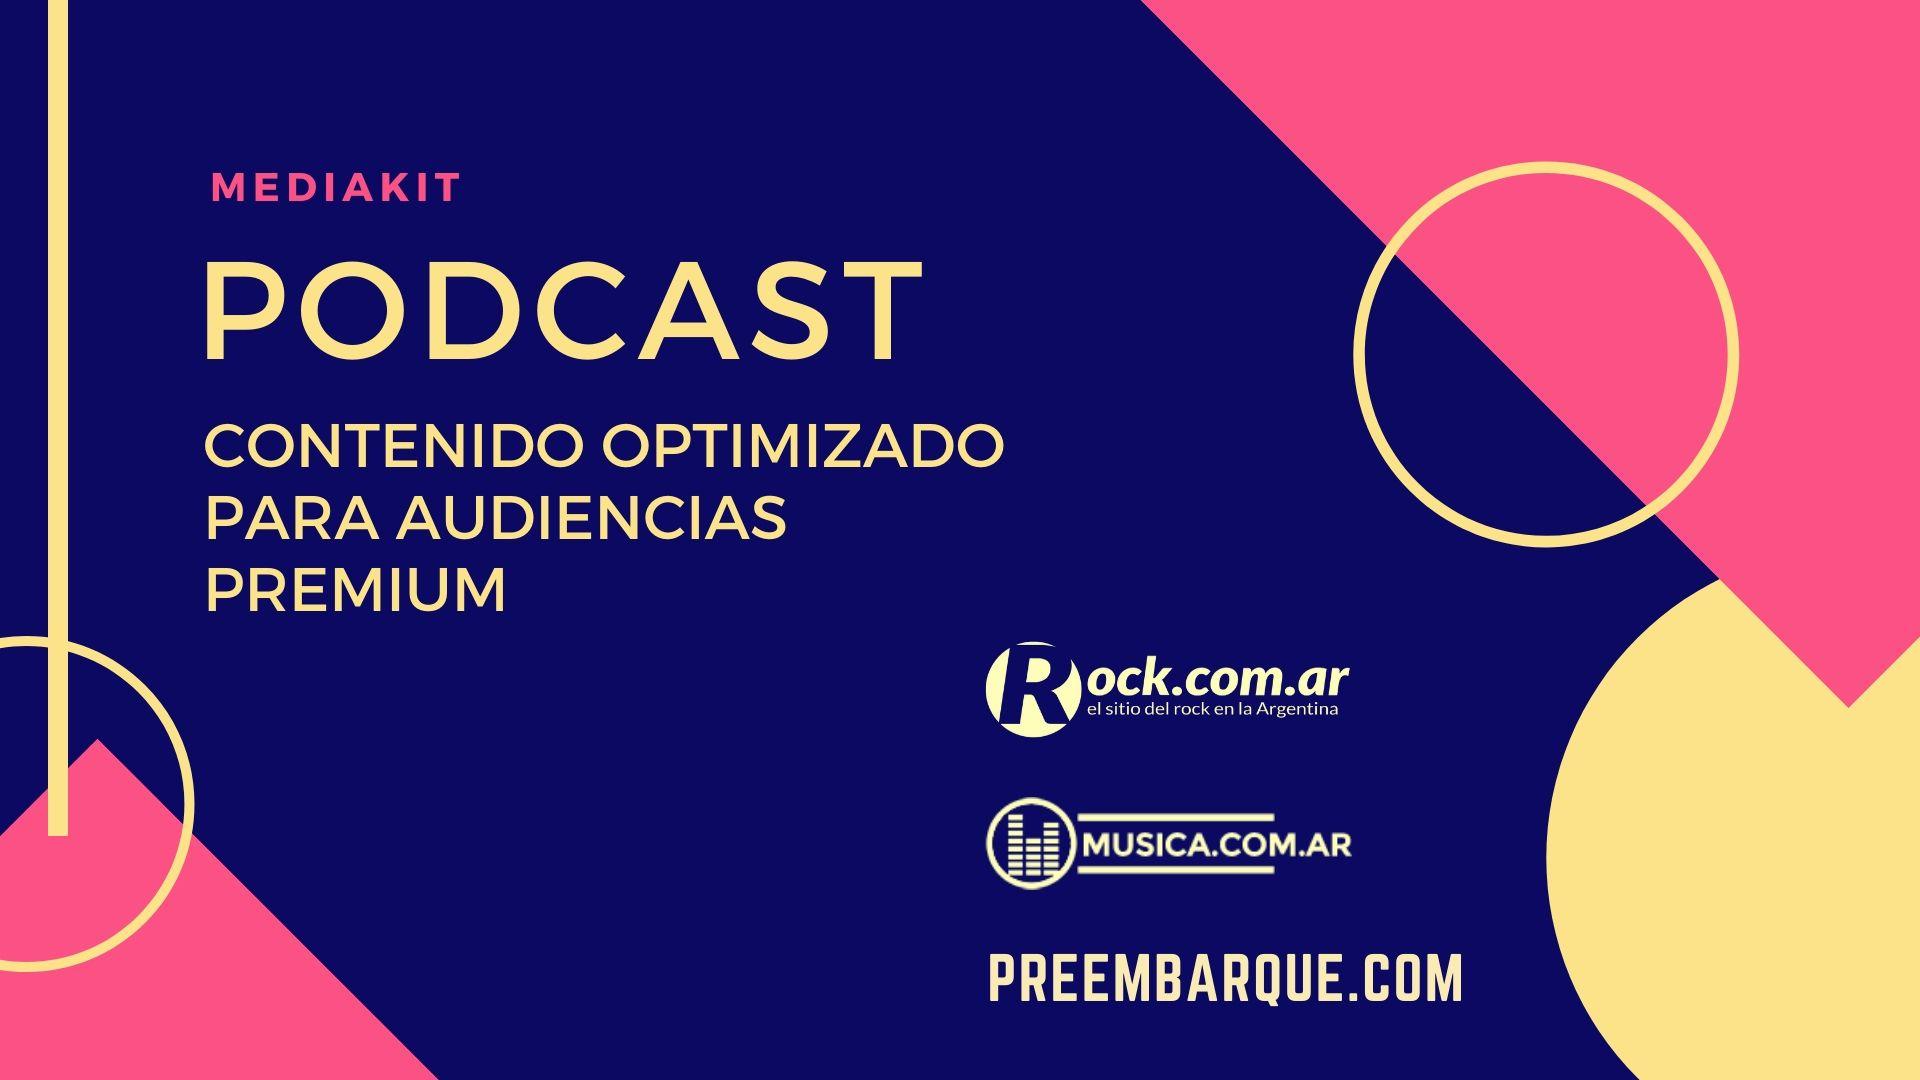 Mediakit Podcast